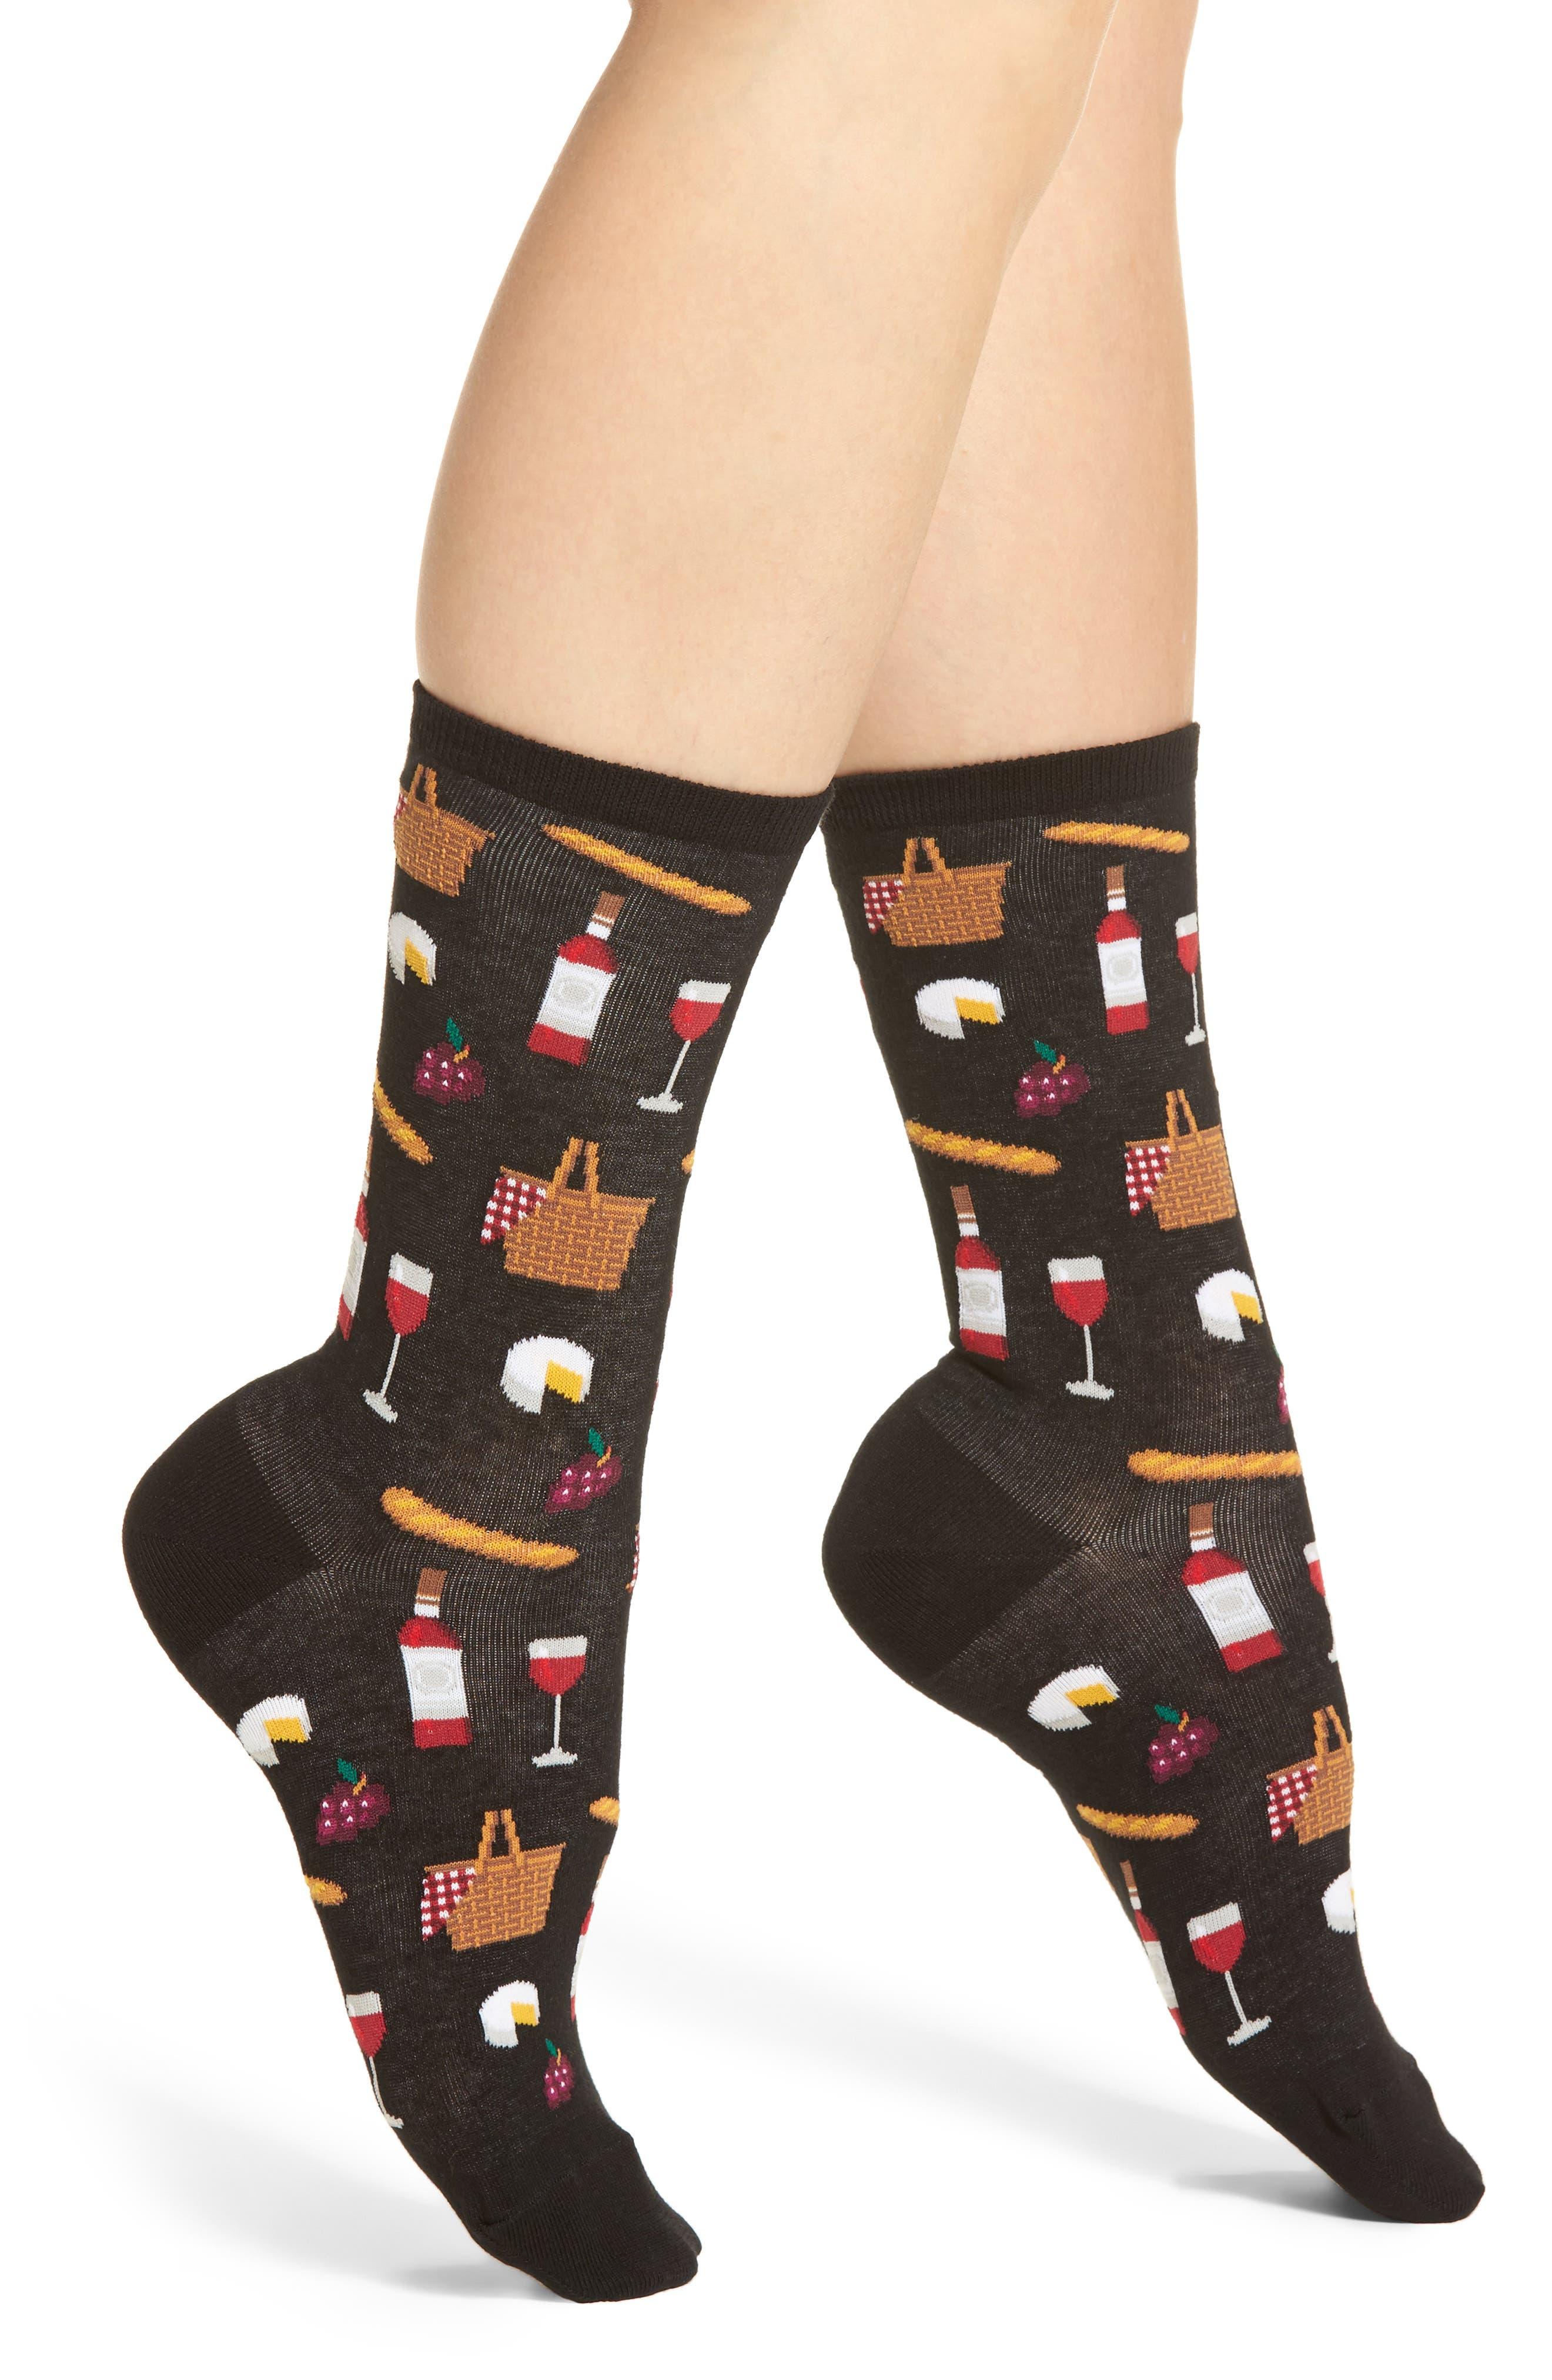 Picnic Crew Socks,                         Main,                         color, 001